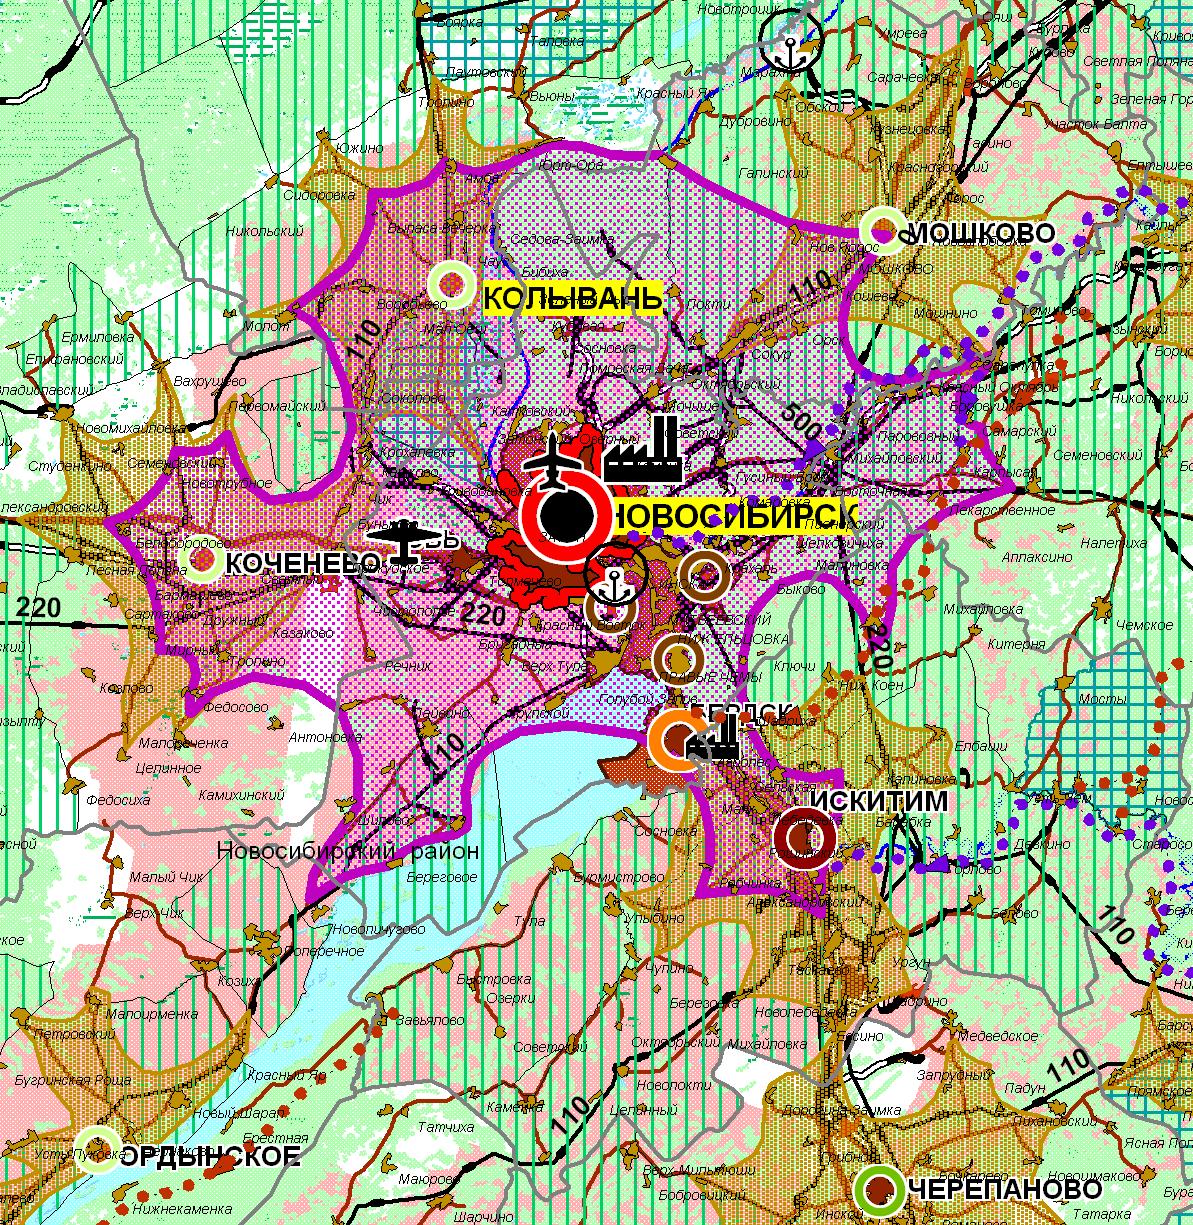 Novosibirsk_urban_agglomeration_3,_Russi